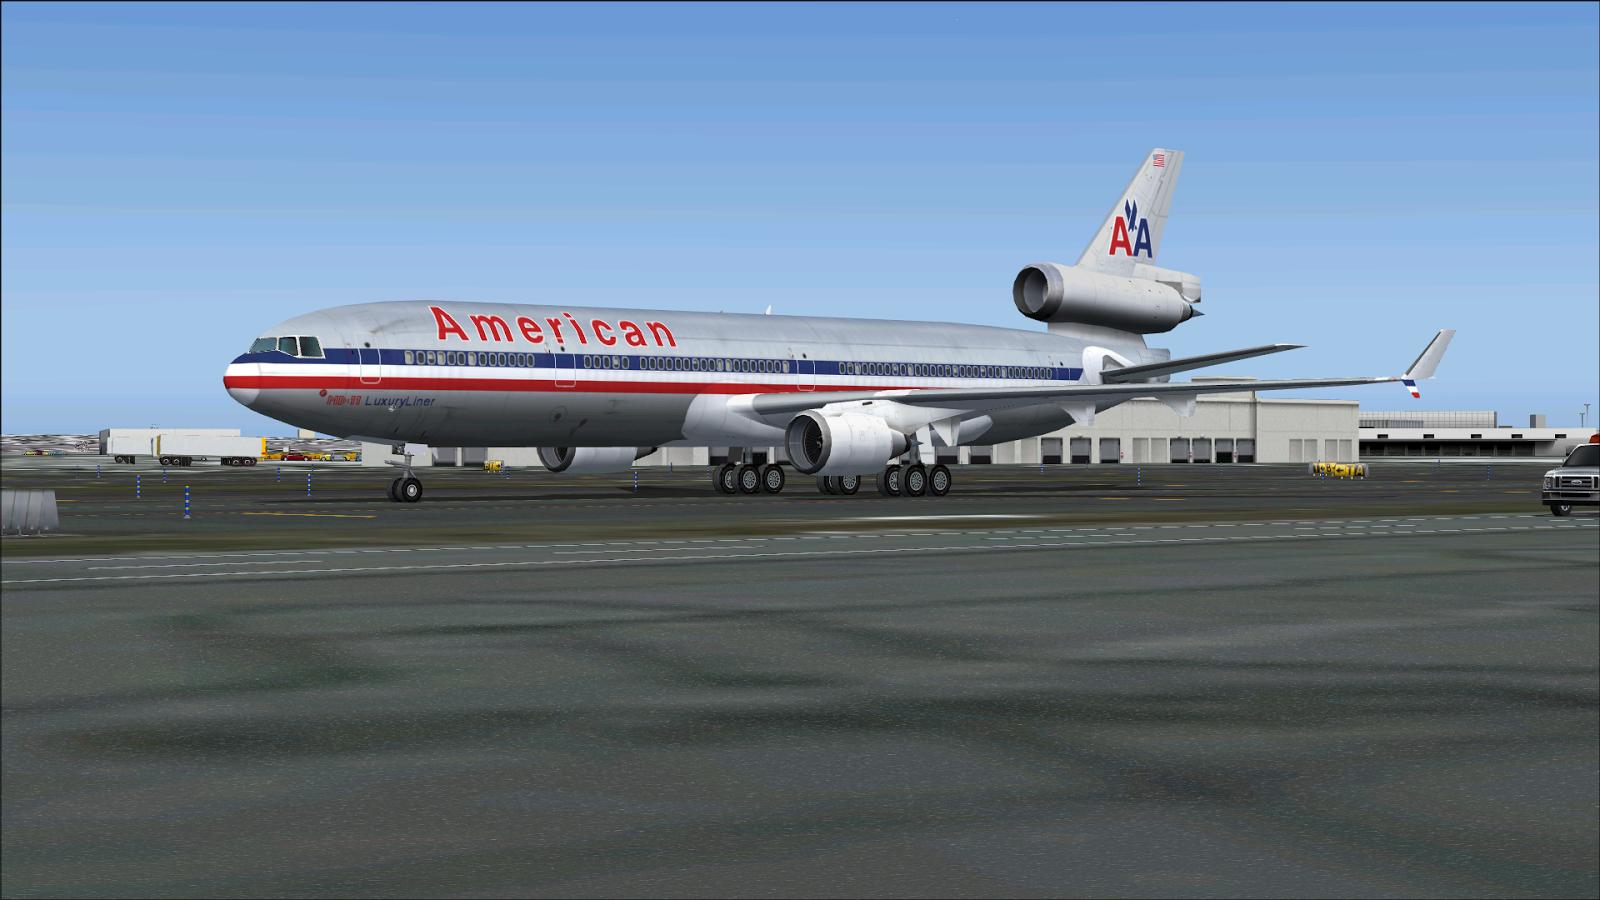 UTT+MD-11+AAL+1968+v7+TATL+Port+1b.png